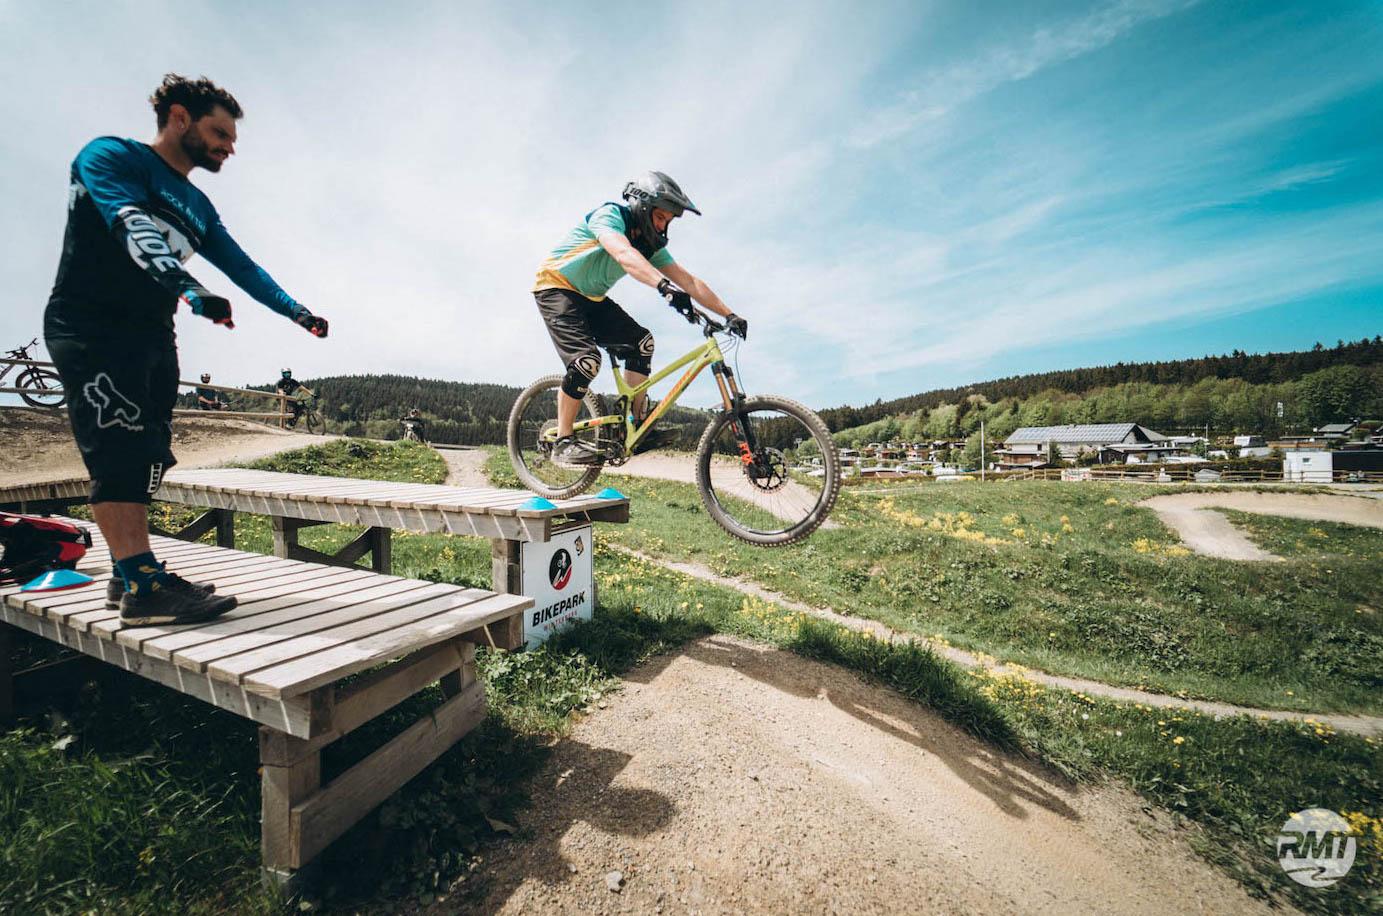 MTB Sprung & Drop Kurs im Trailpark Erbeskopf - Fahrtechnik Training Rock my Trail Bikeschule